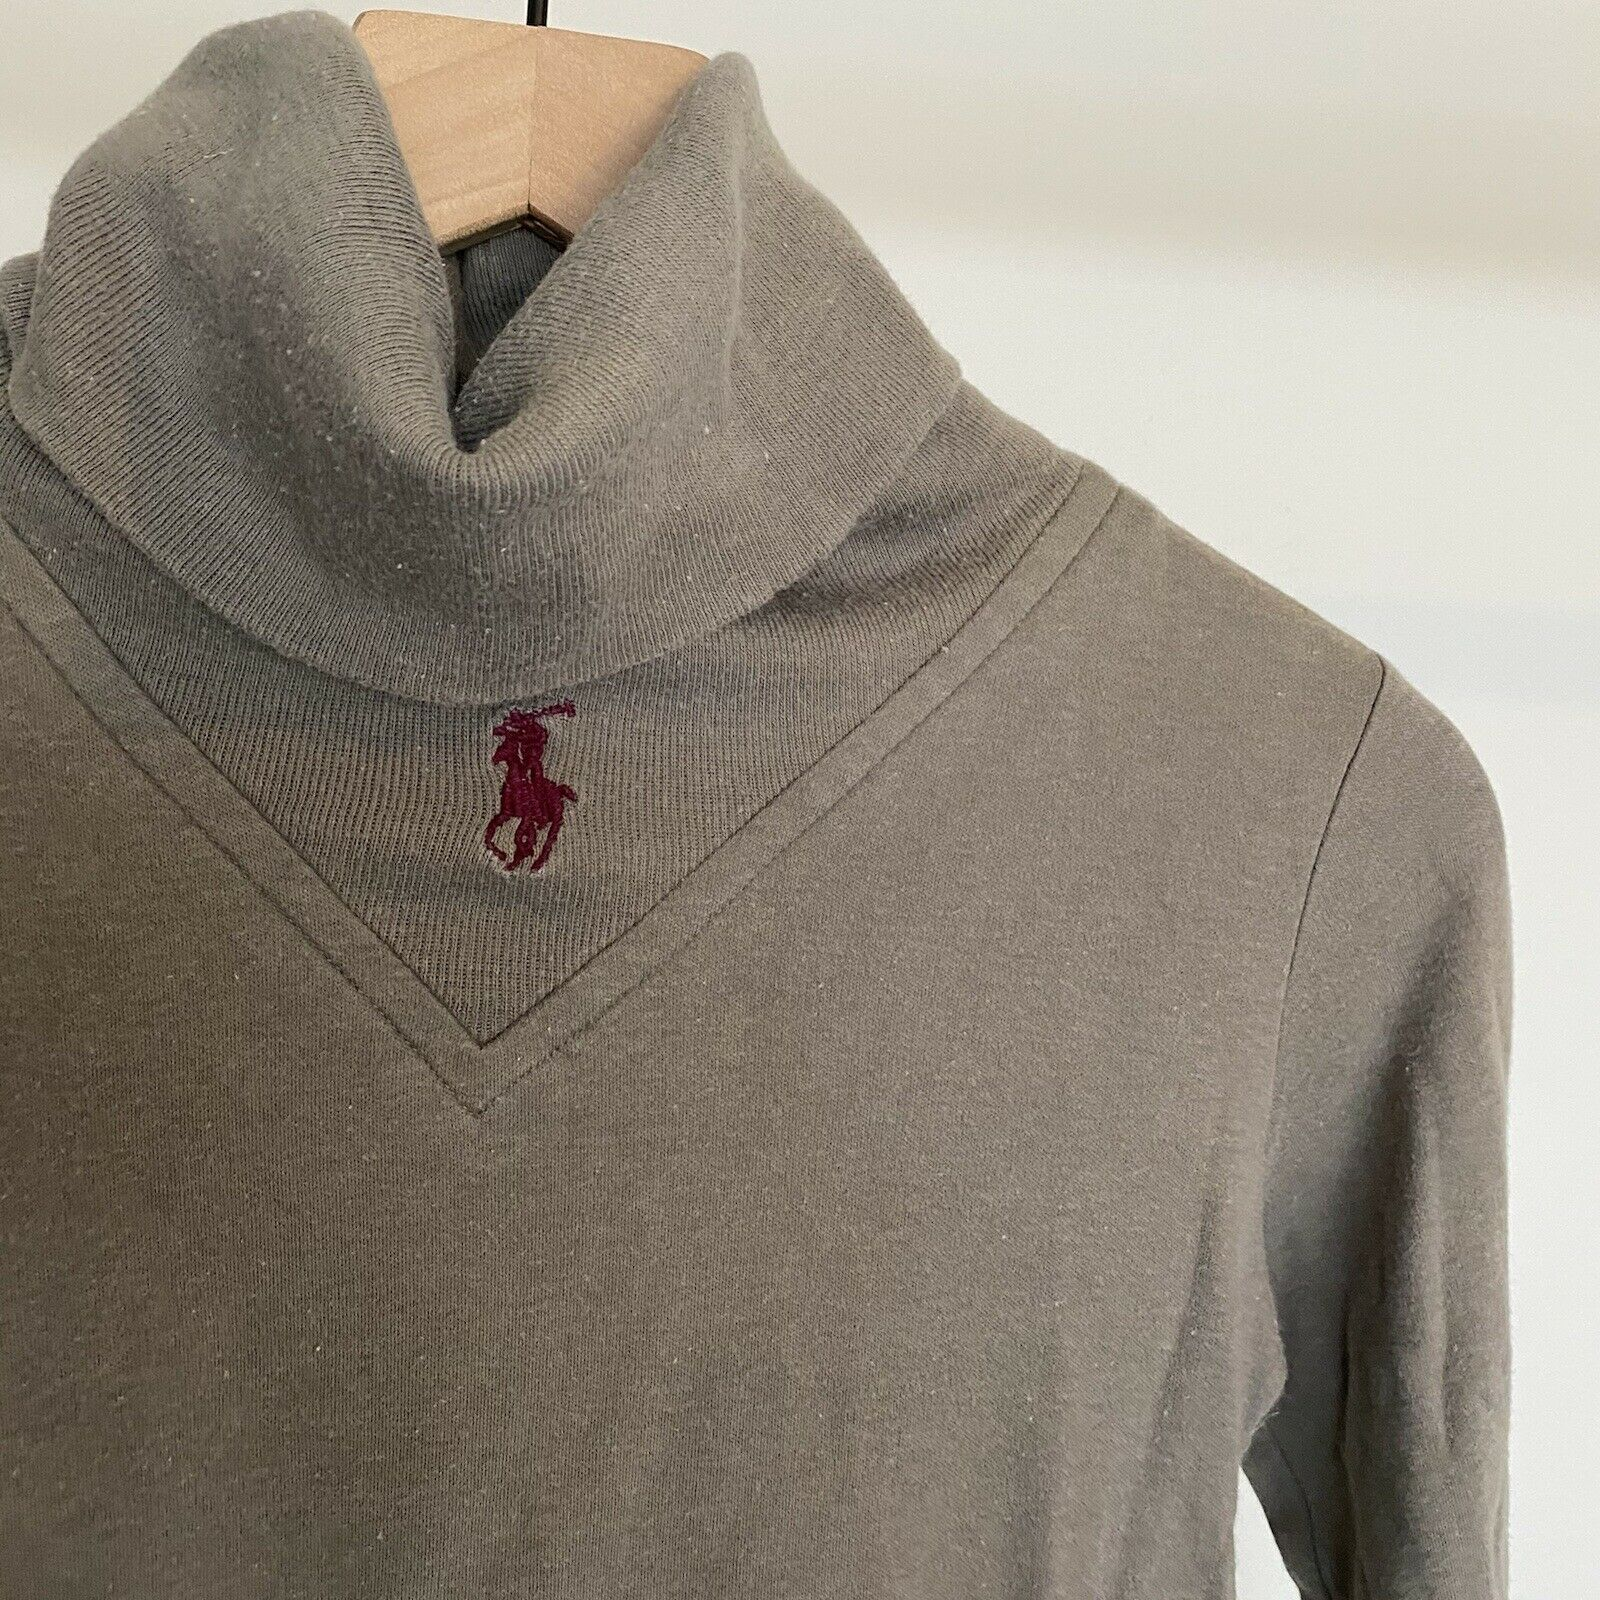 Vtg 80s 90s Ralph Lauren Turtleneck Sweater Cente… - image 2